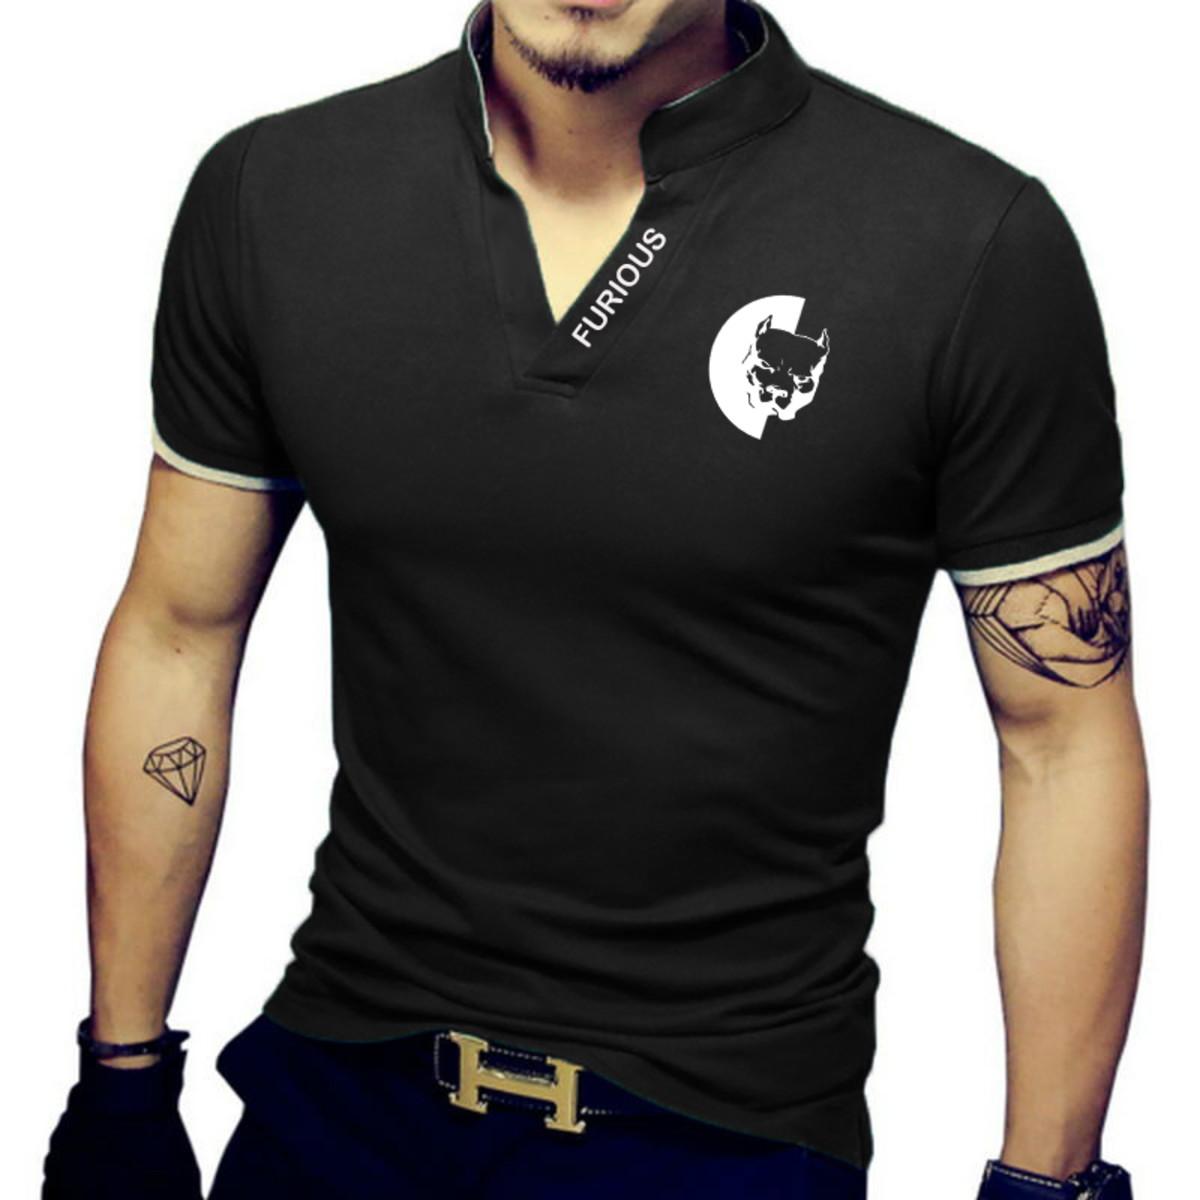 808fdbdc1c790 Camiseta pólo modelo exclusivo gola alta Pit Bull no Elo7